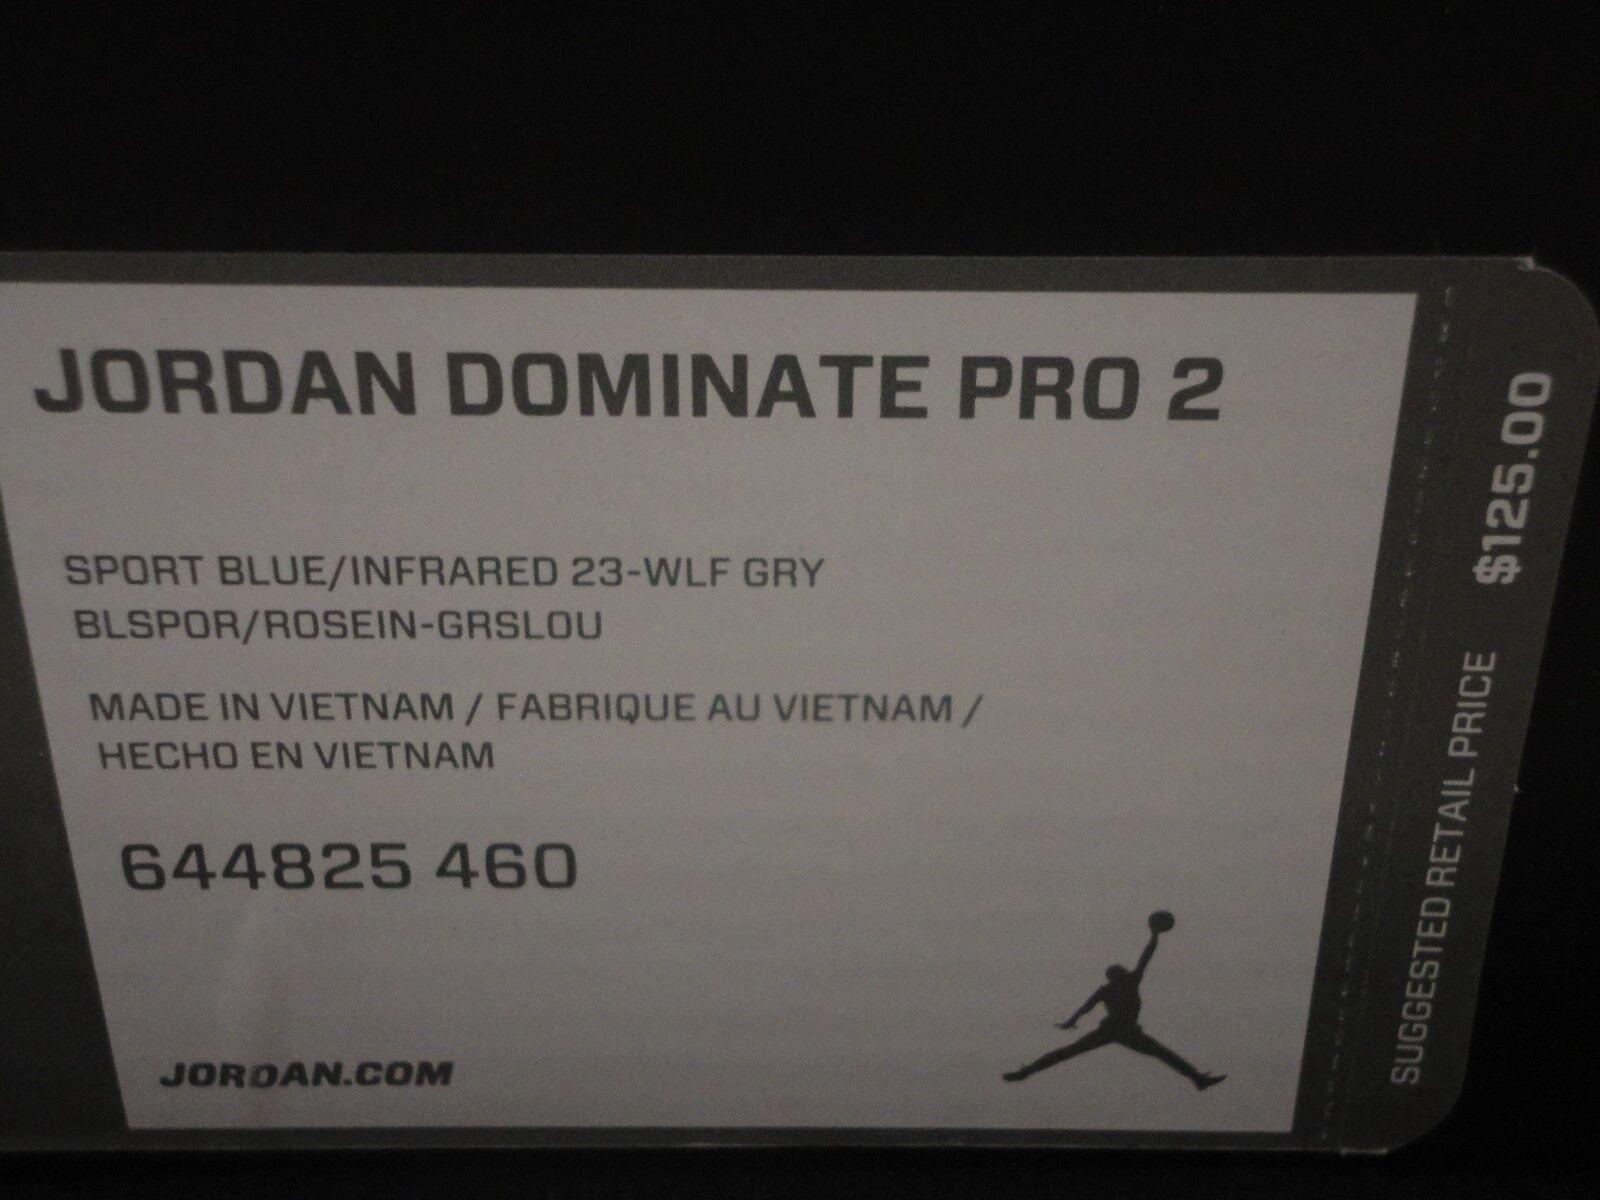 nike air jordan dominieren pro infrarot 2, sport, blau / infrarot pro - 23, größe 12 f1c0f6